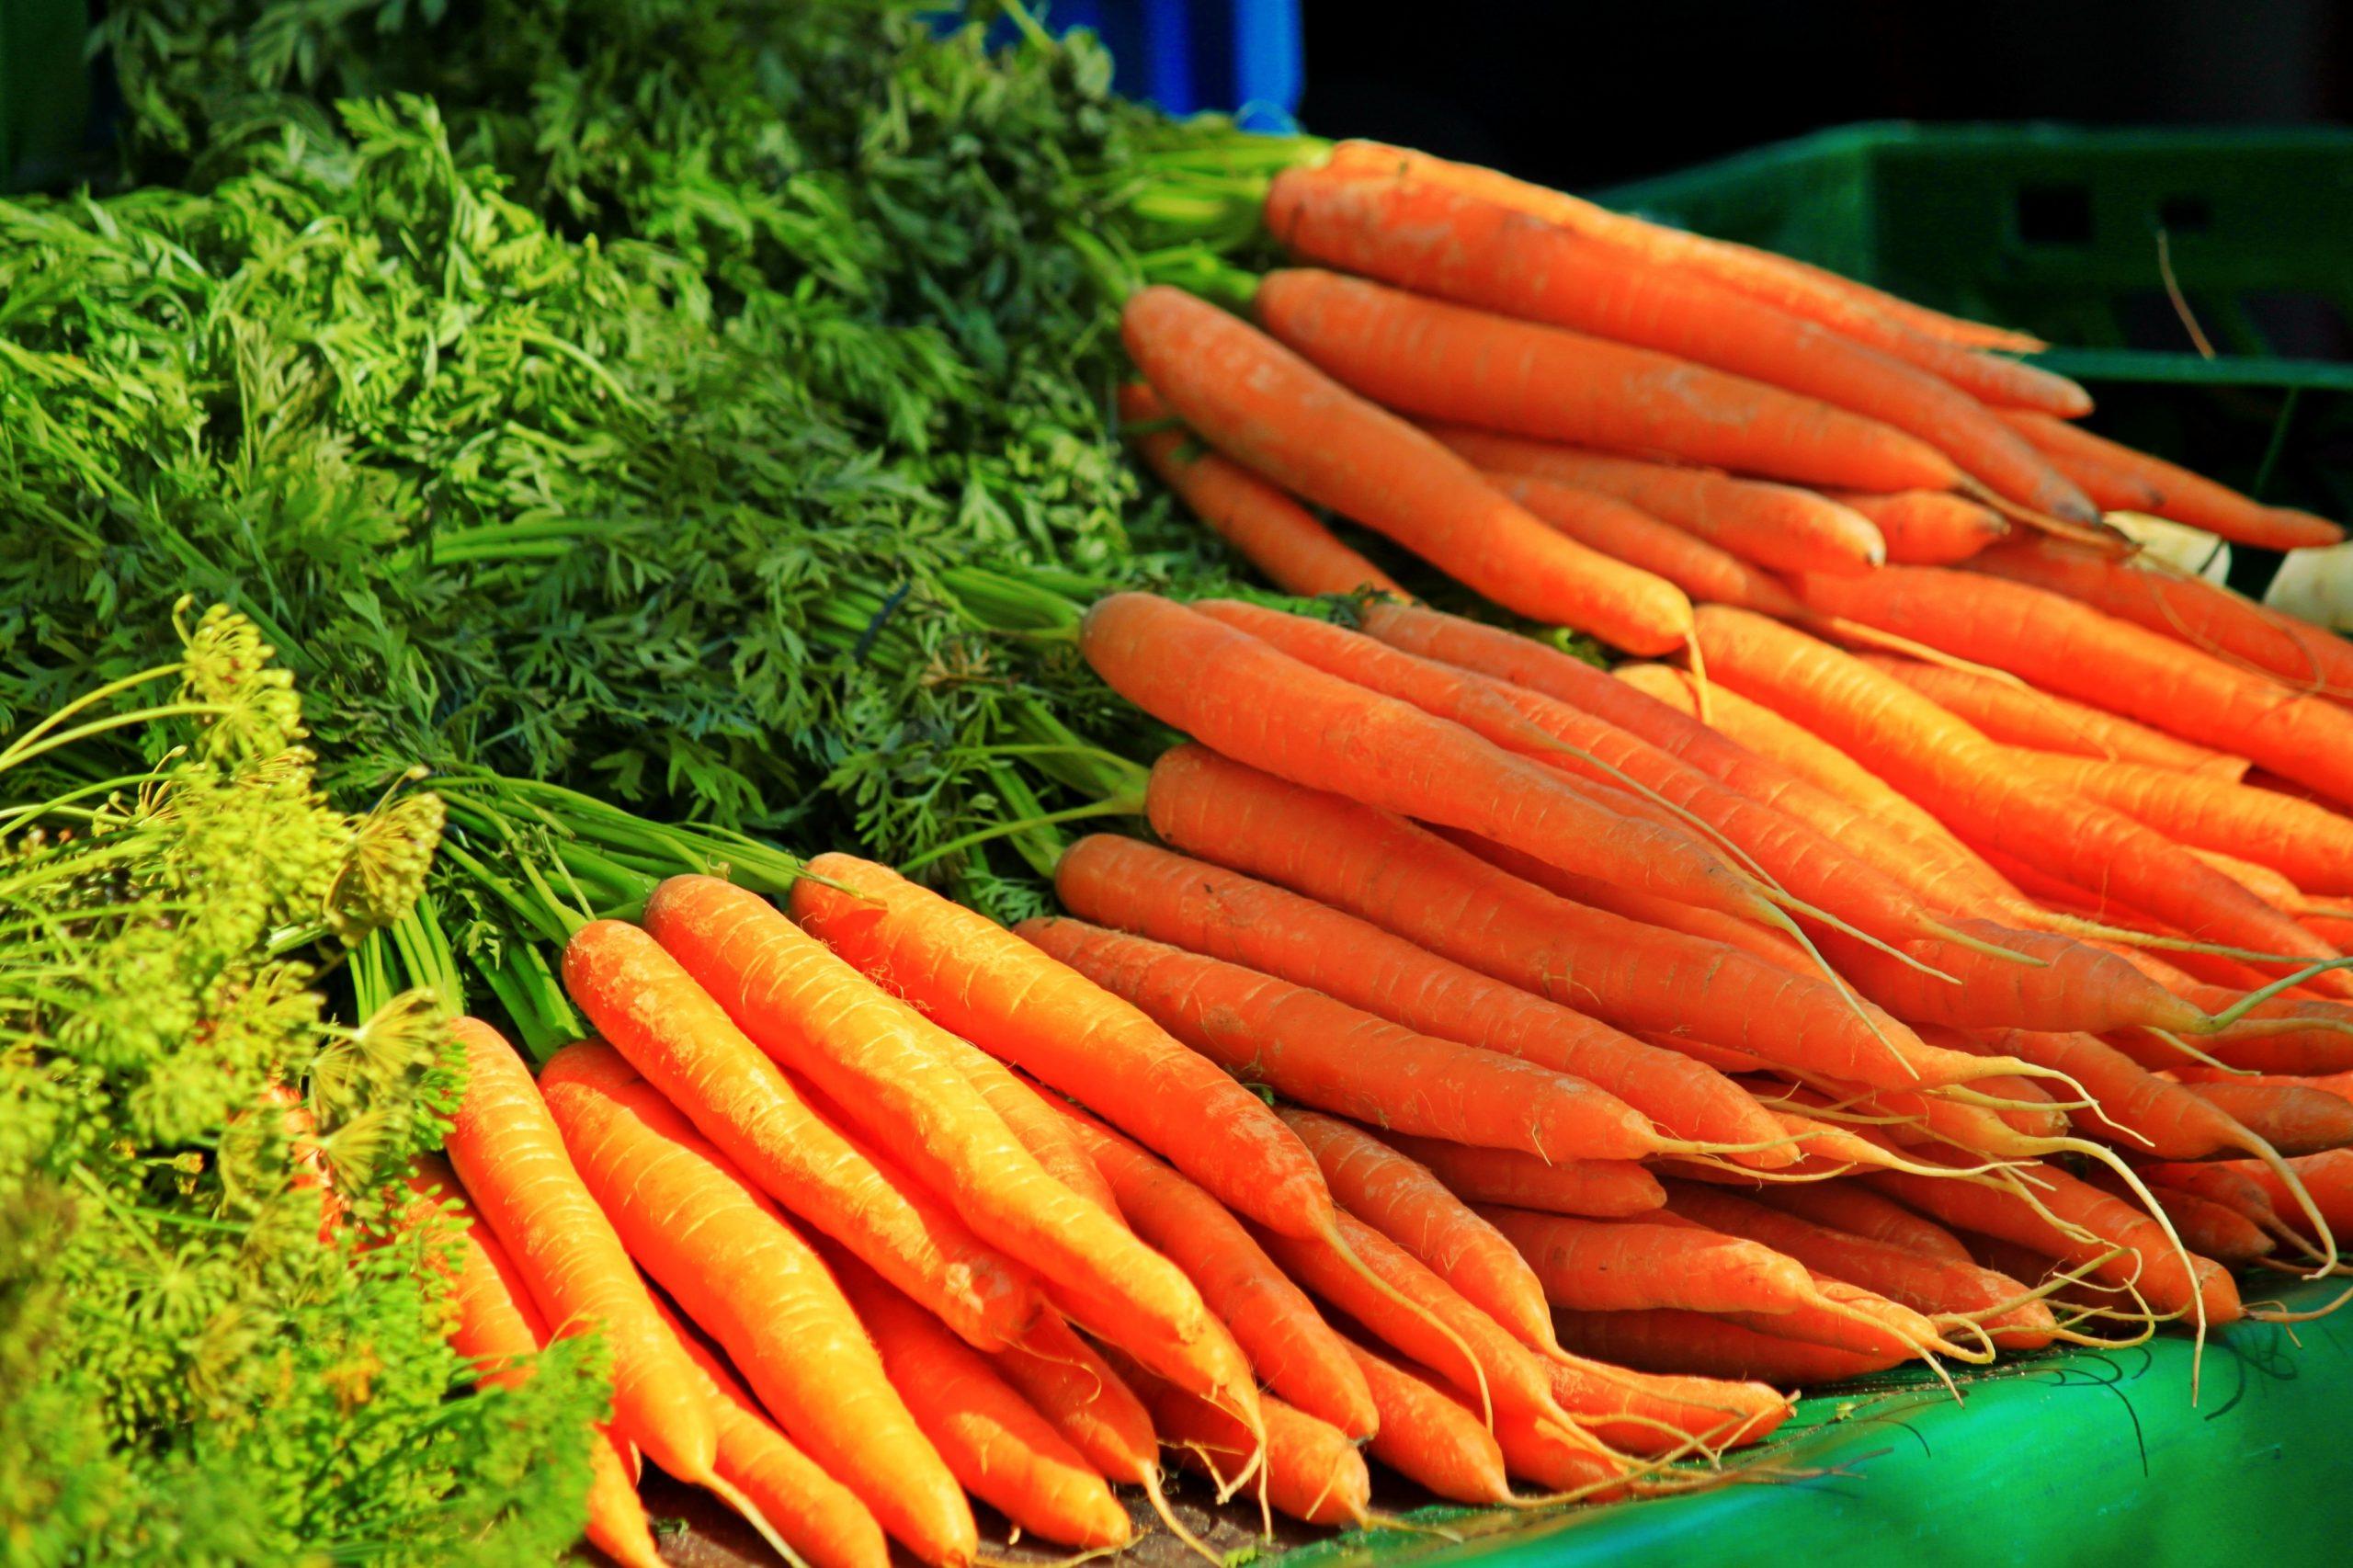 Carrot / Keraṭ / கேரட்